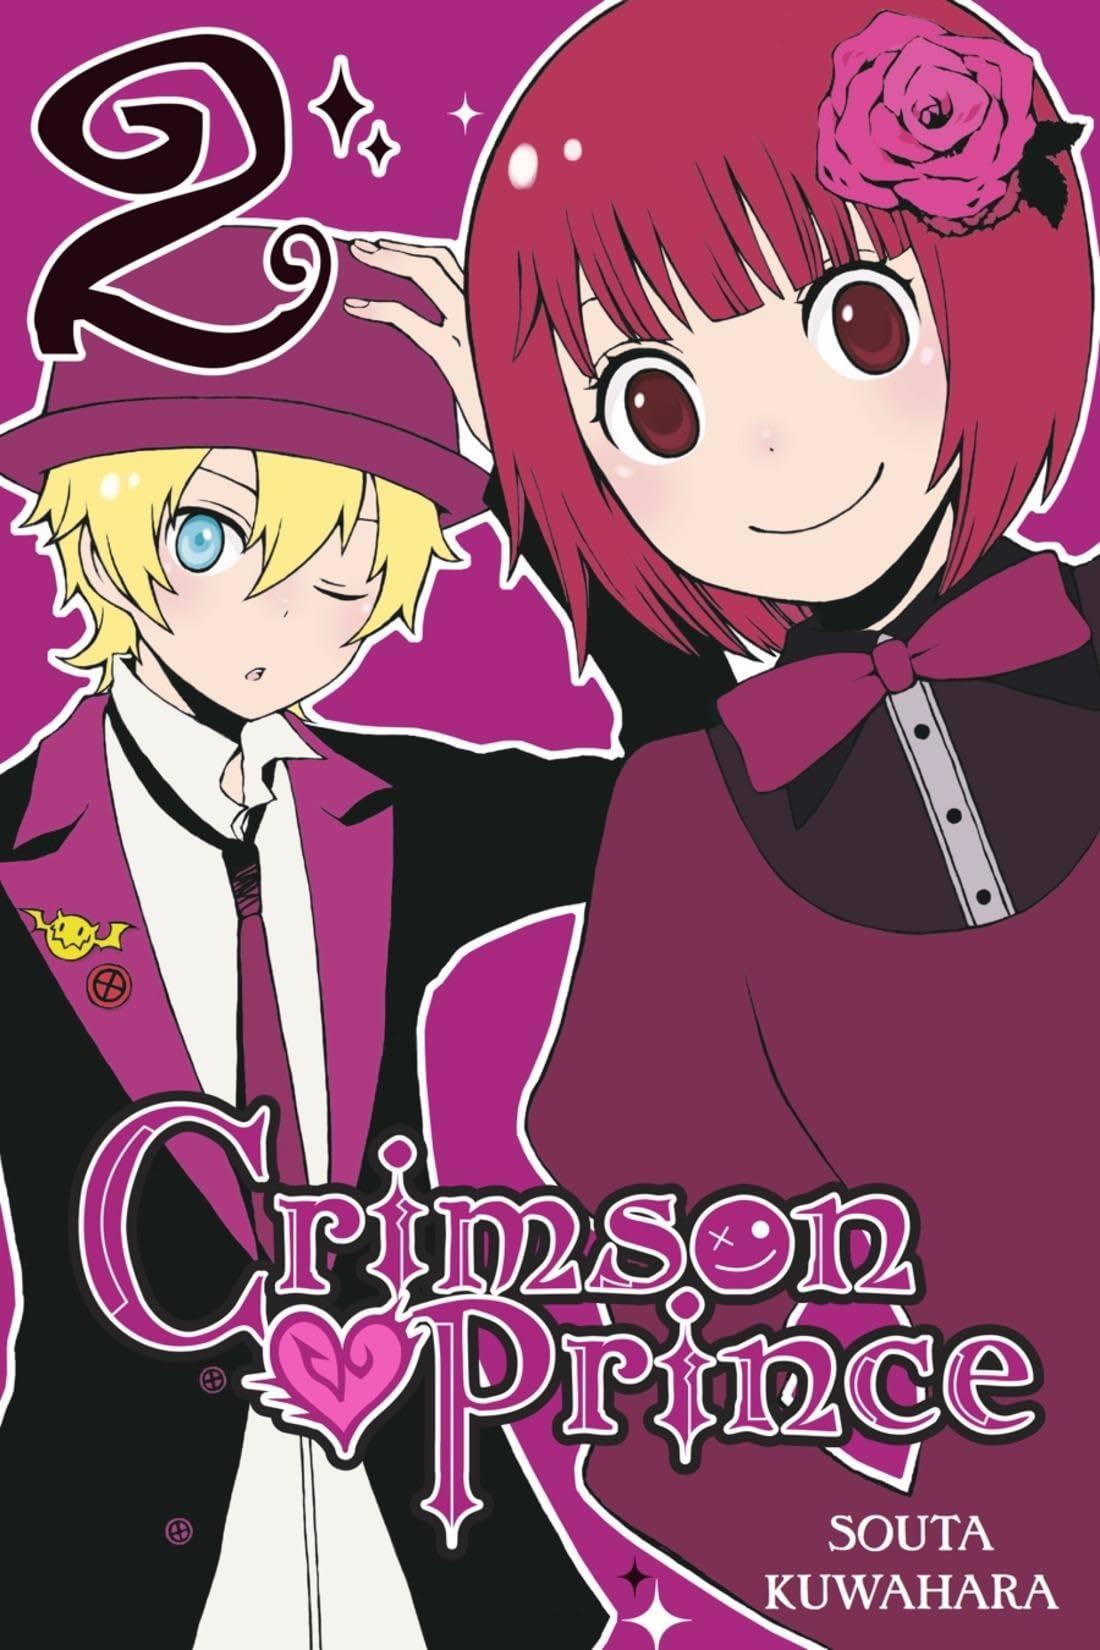 Crimson Prince Vol. 2